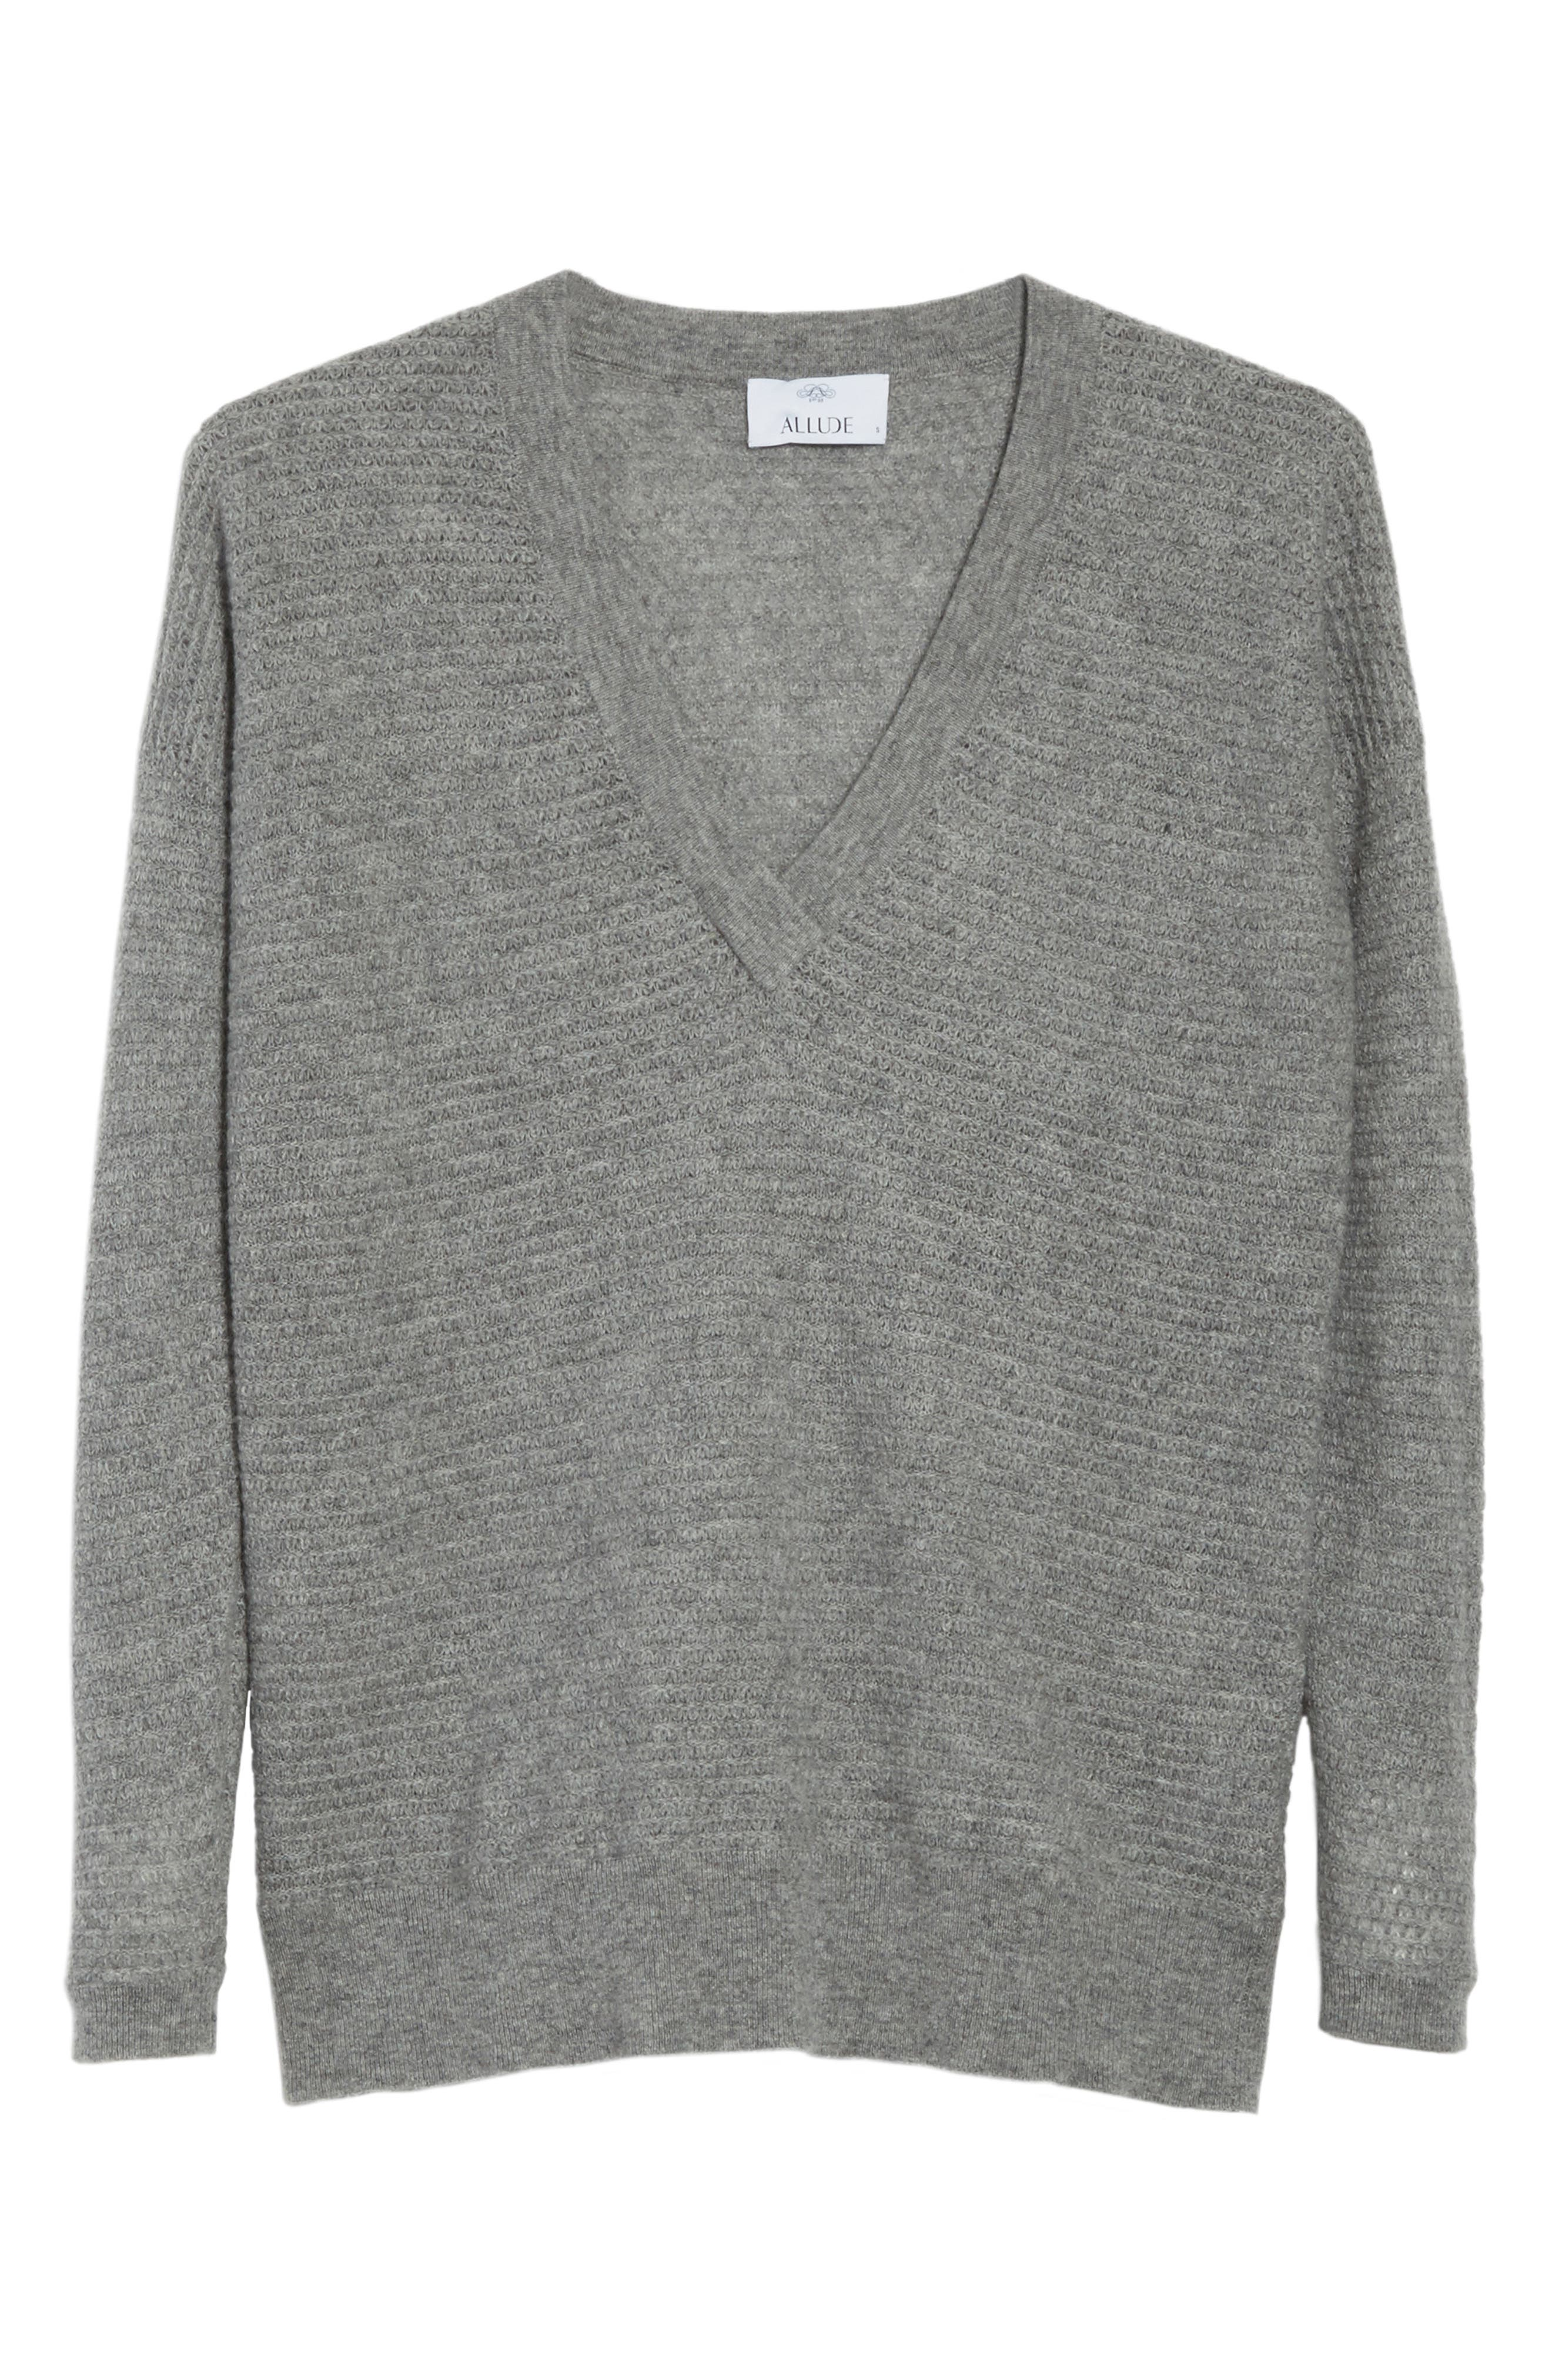 Cashmere V-Neck Sweater,                             Alternate thumbnail 6, color,                             Grey Marl